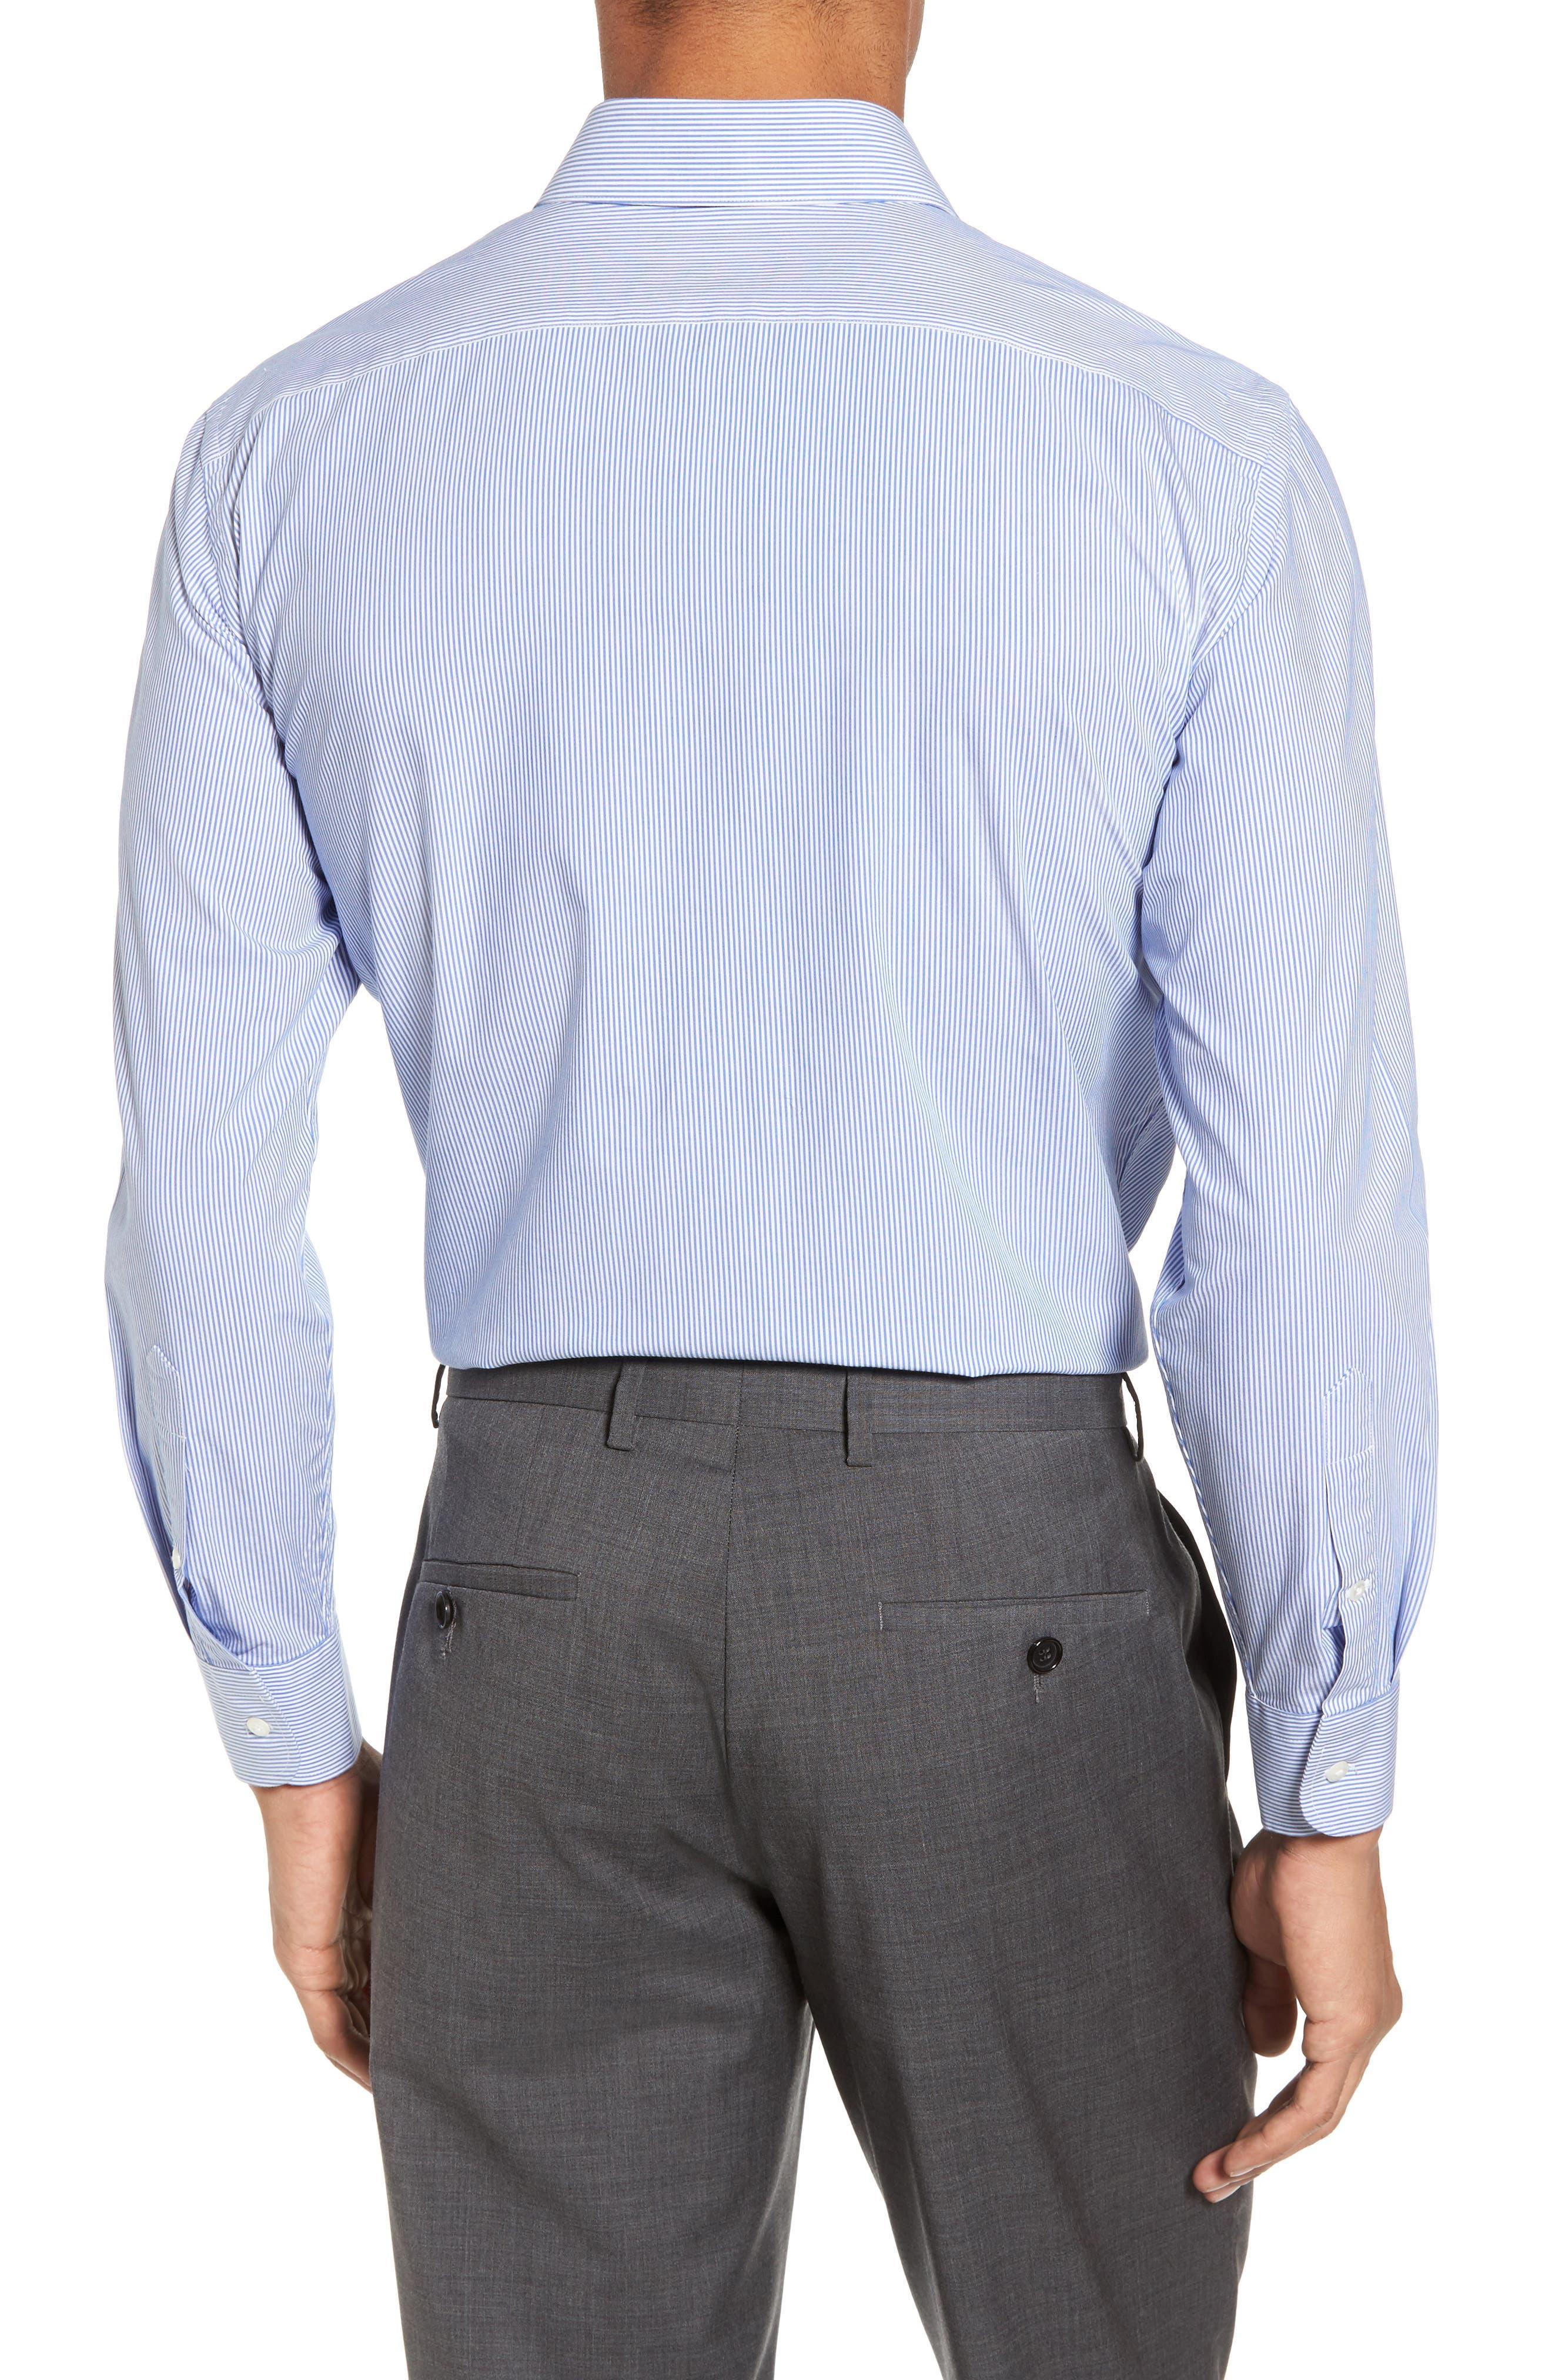 Tech-Smart Trim Fit Stretch Stripe Dress Shirt,                             Alternate thumbnail 2, color,                             420